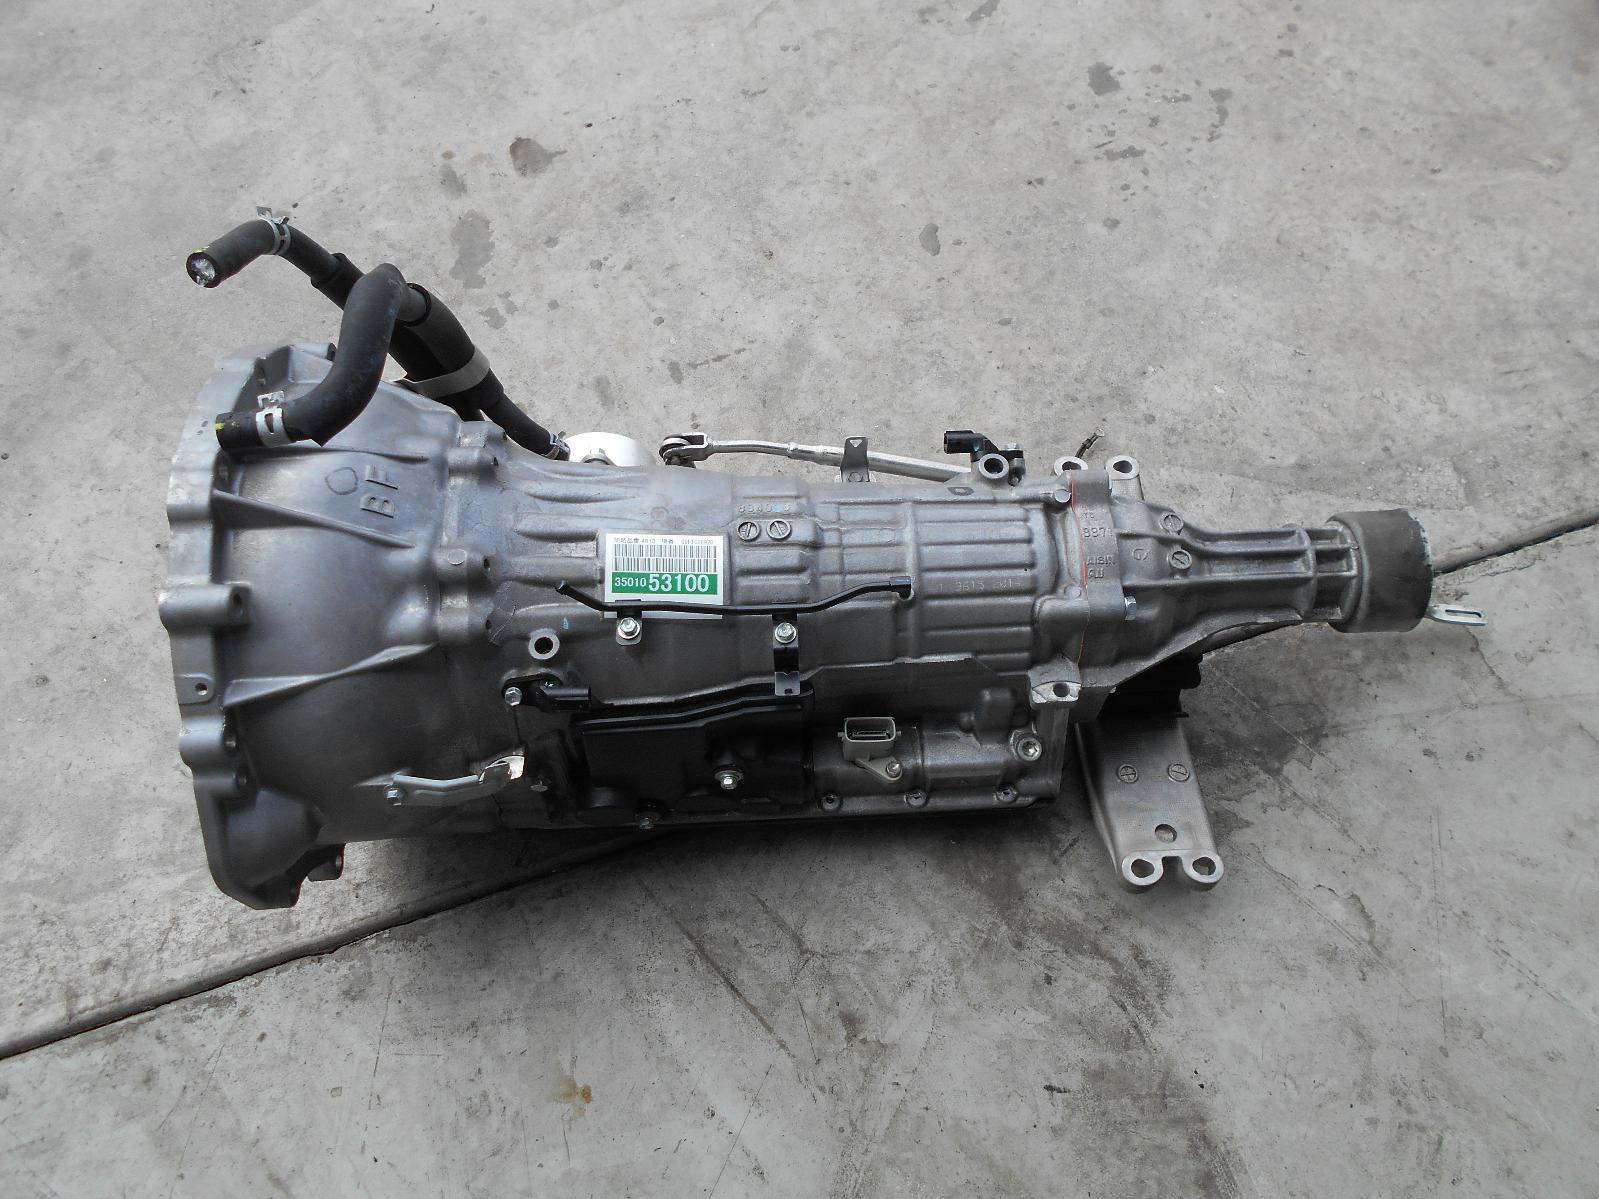 LEXUS IS250/IS250C, Trans/Gearbox, AUTO, PETROL, 2.5, 4GR, IS250/IS250C, GSE20R, 11/05-12/14